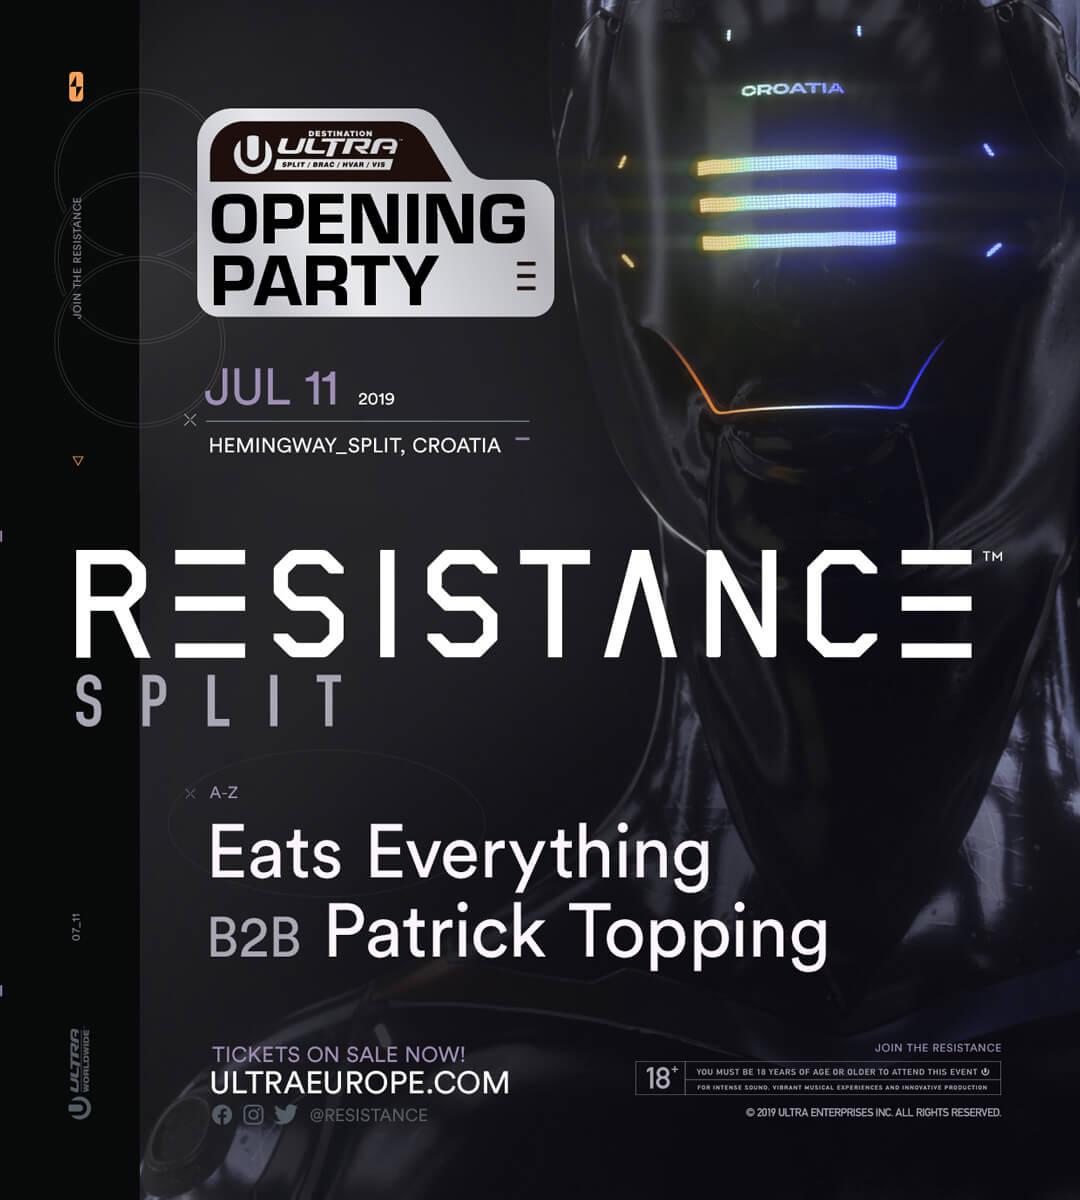 RESISTANCE Split (Destination Ultra Opening Party)